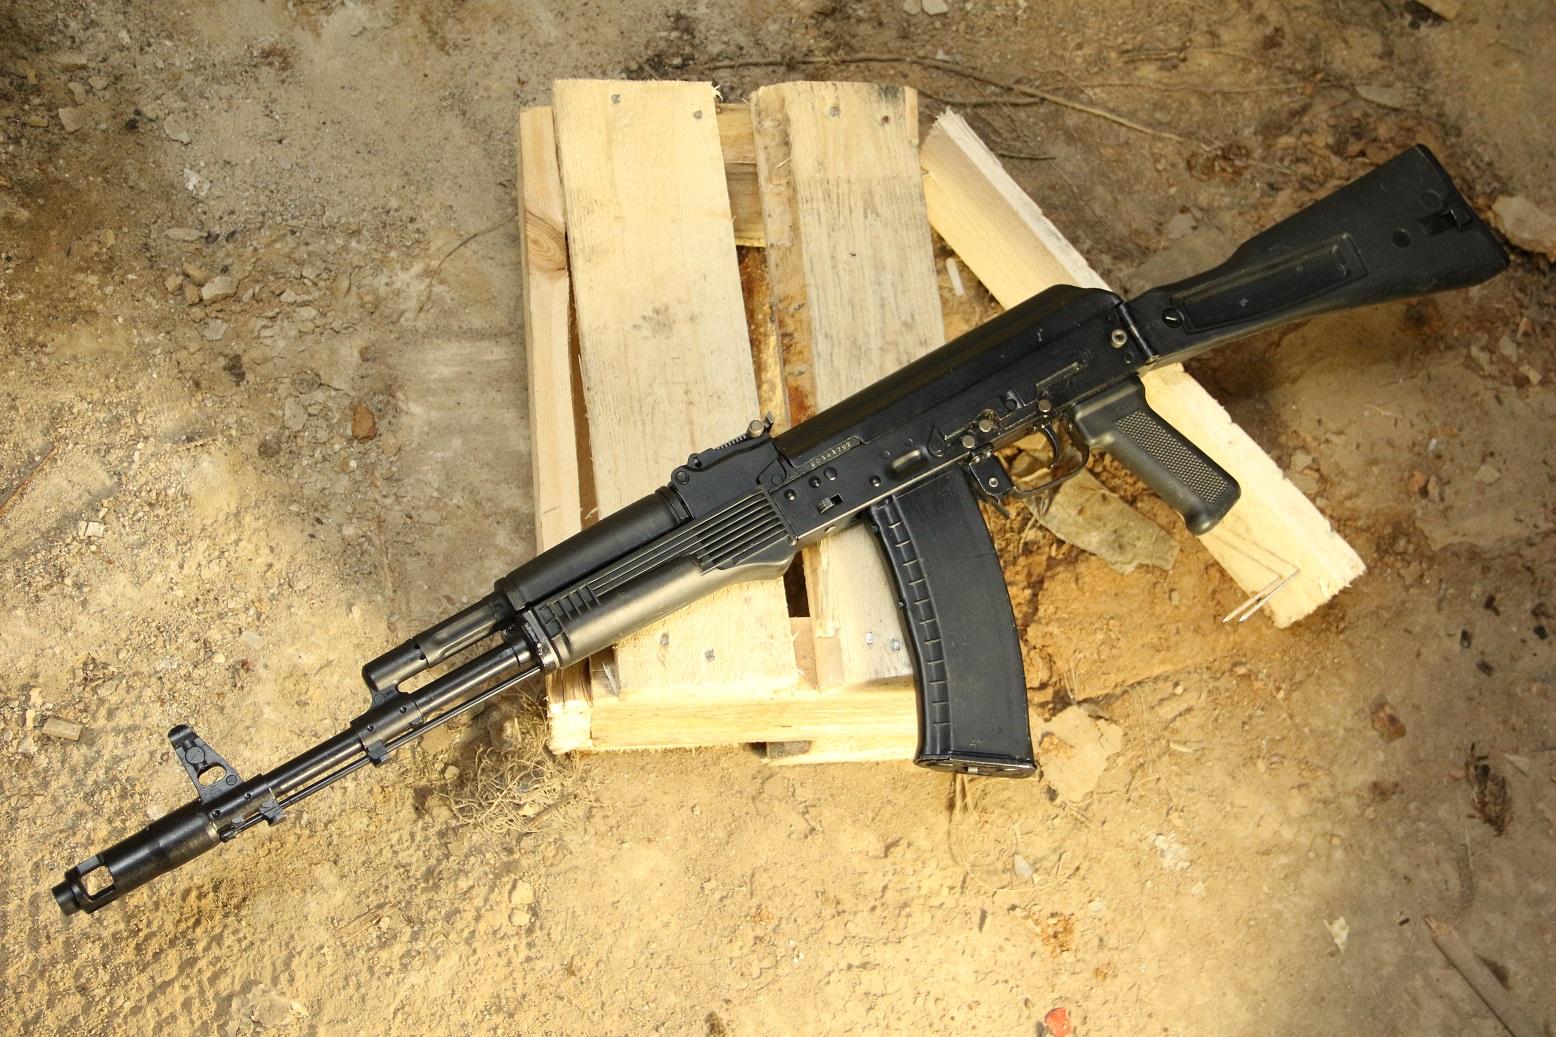 АК-74М, 2000 год выпуска, №00141792